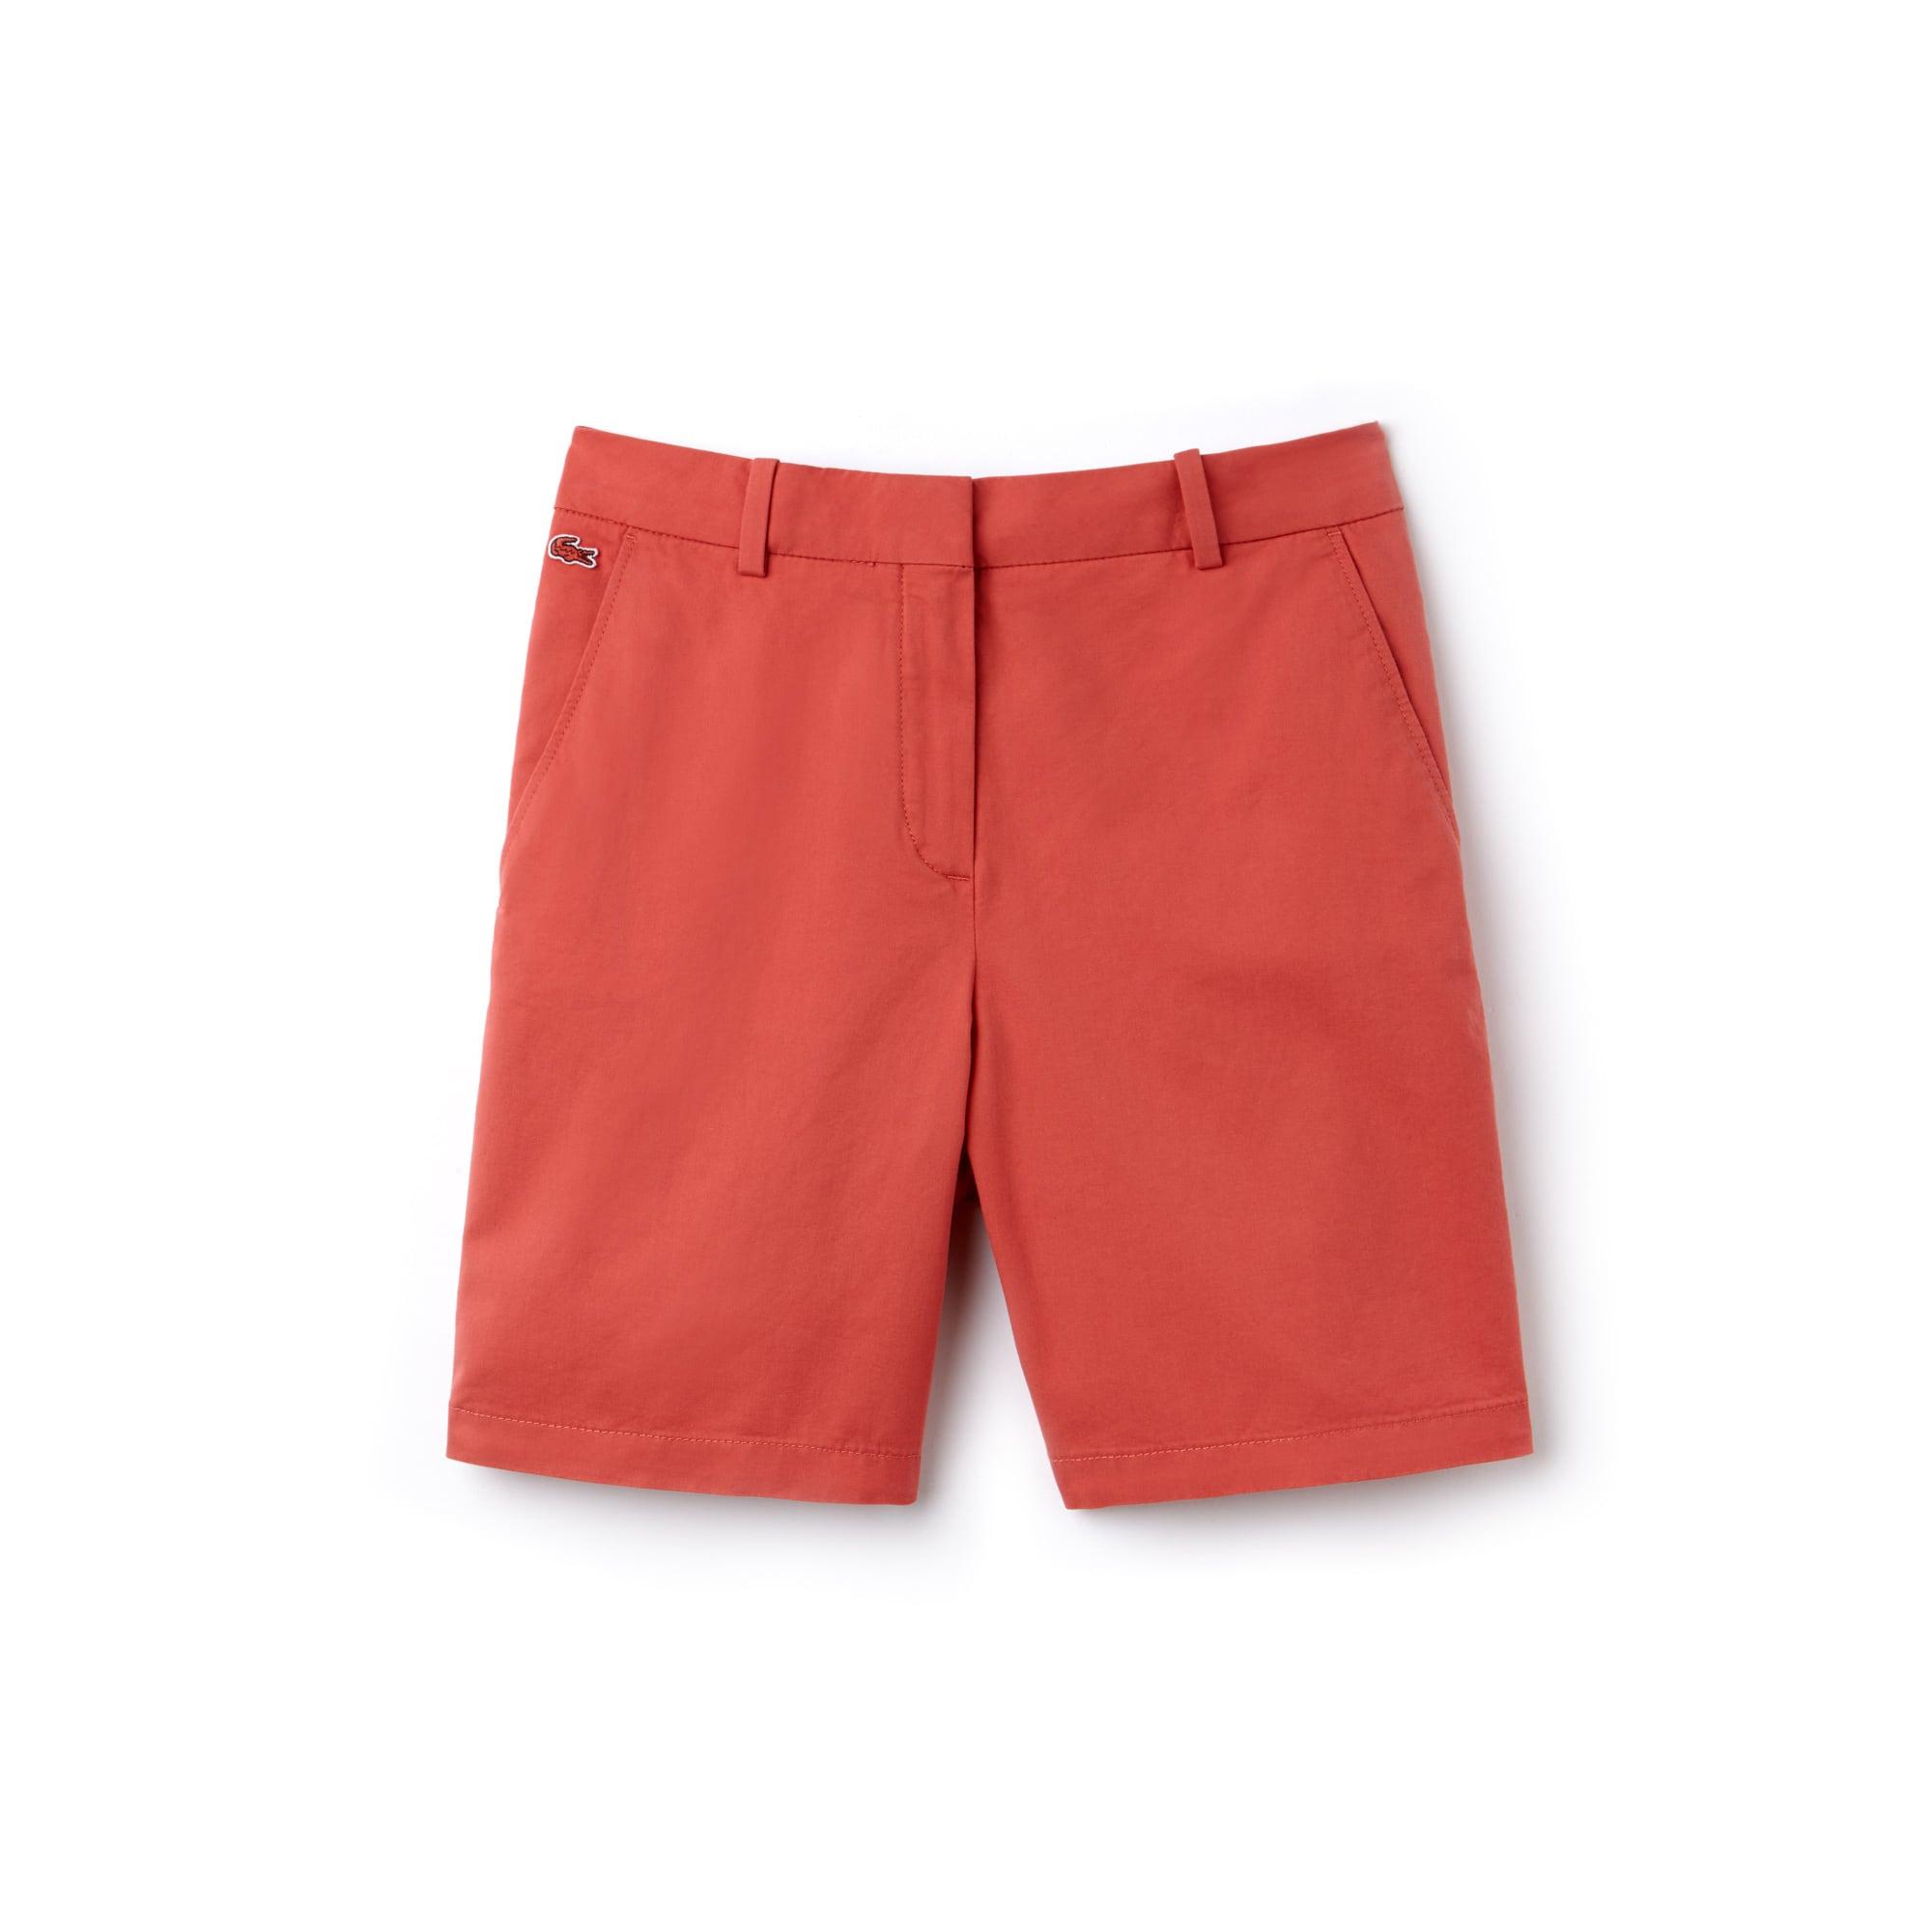 Women's Stretch Bermuda Shorts